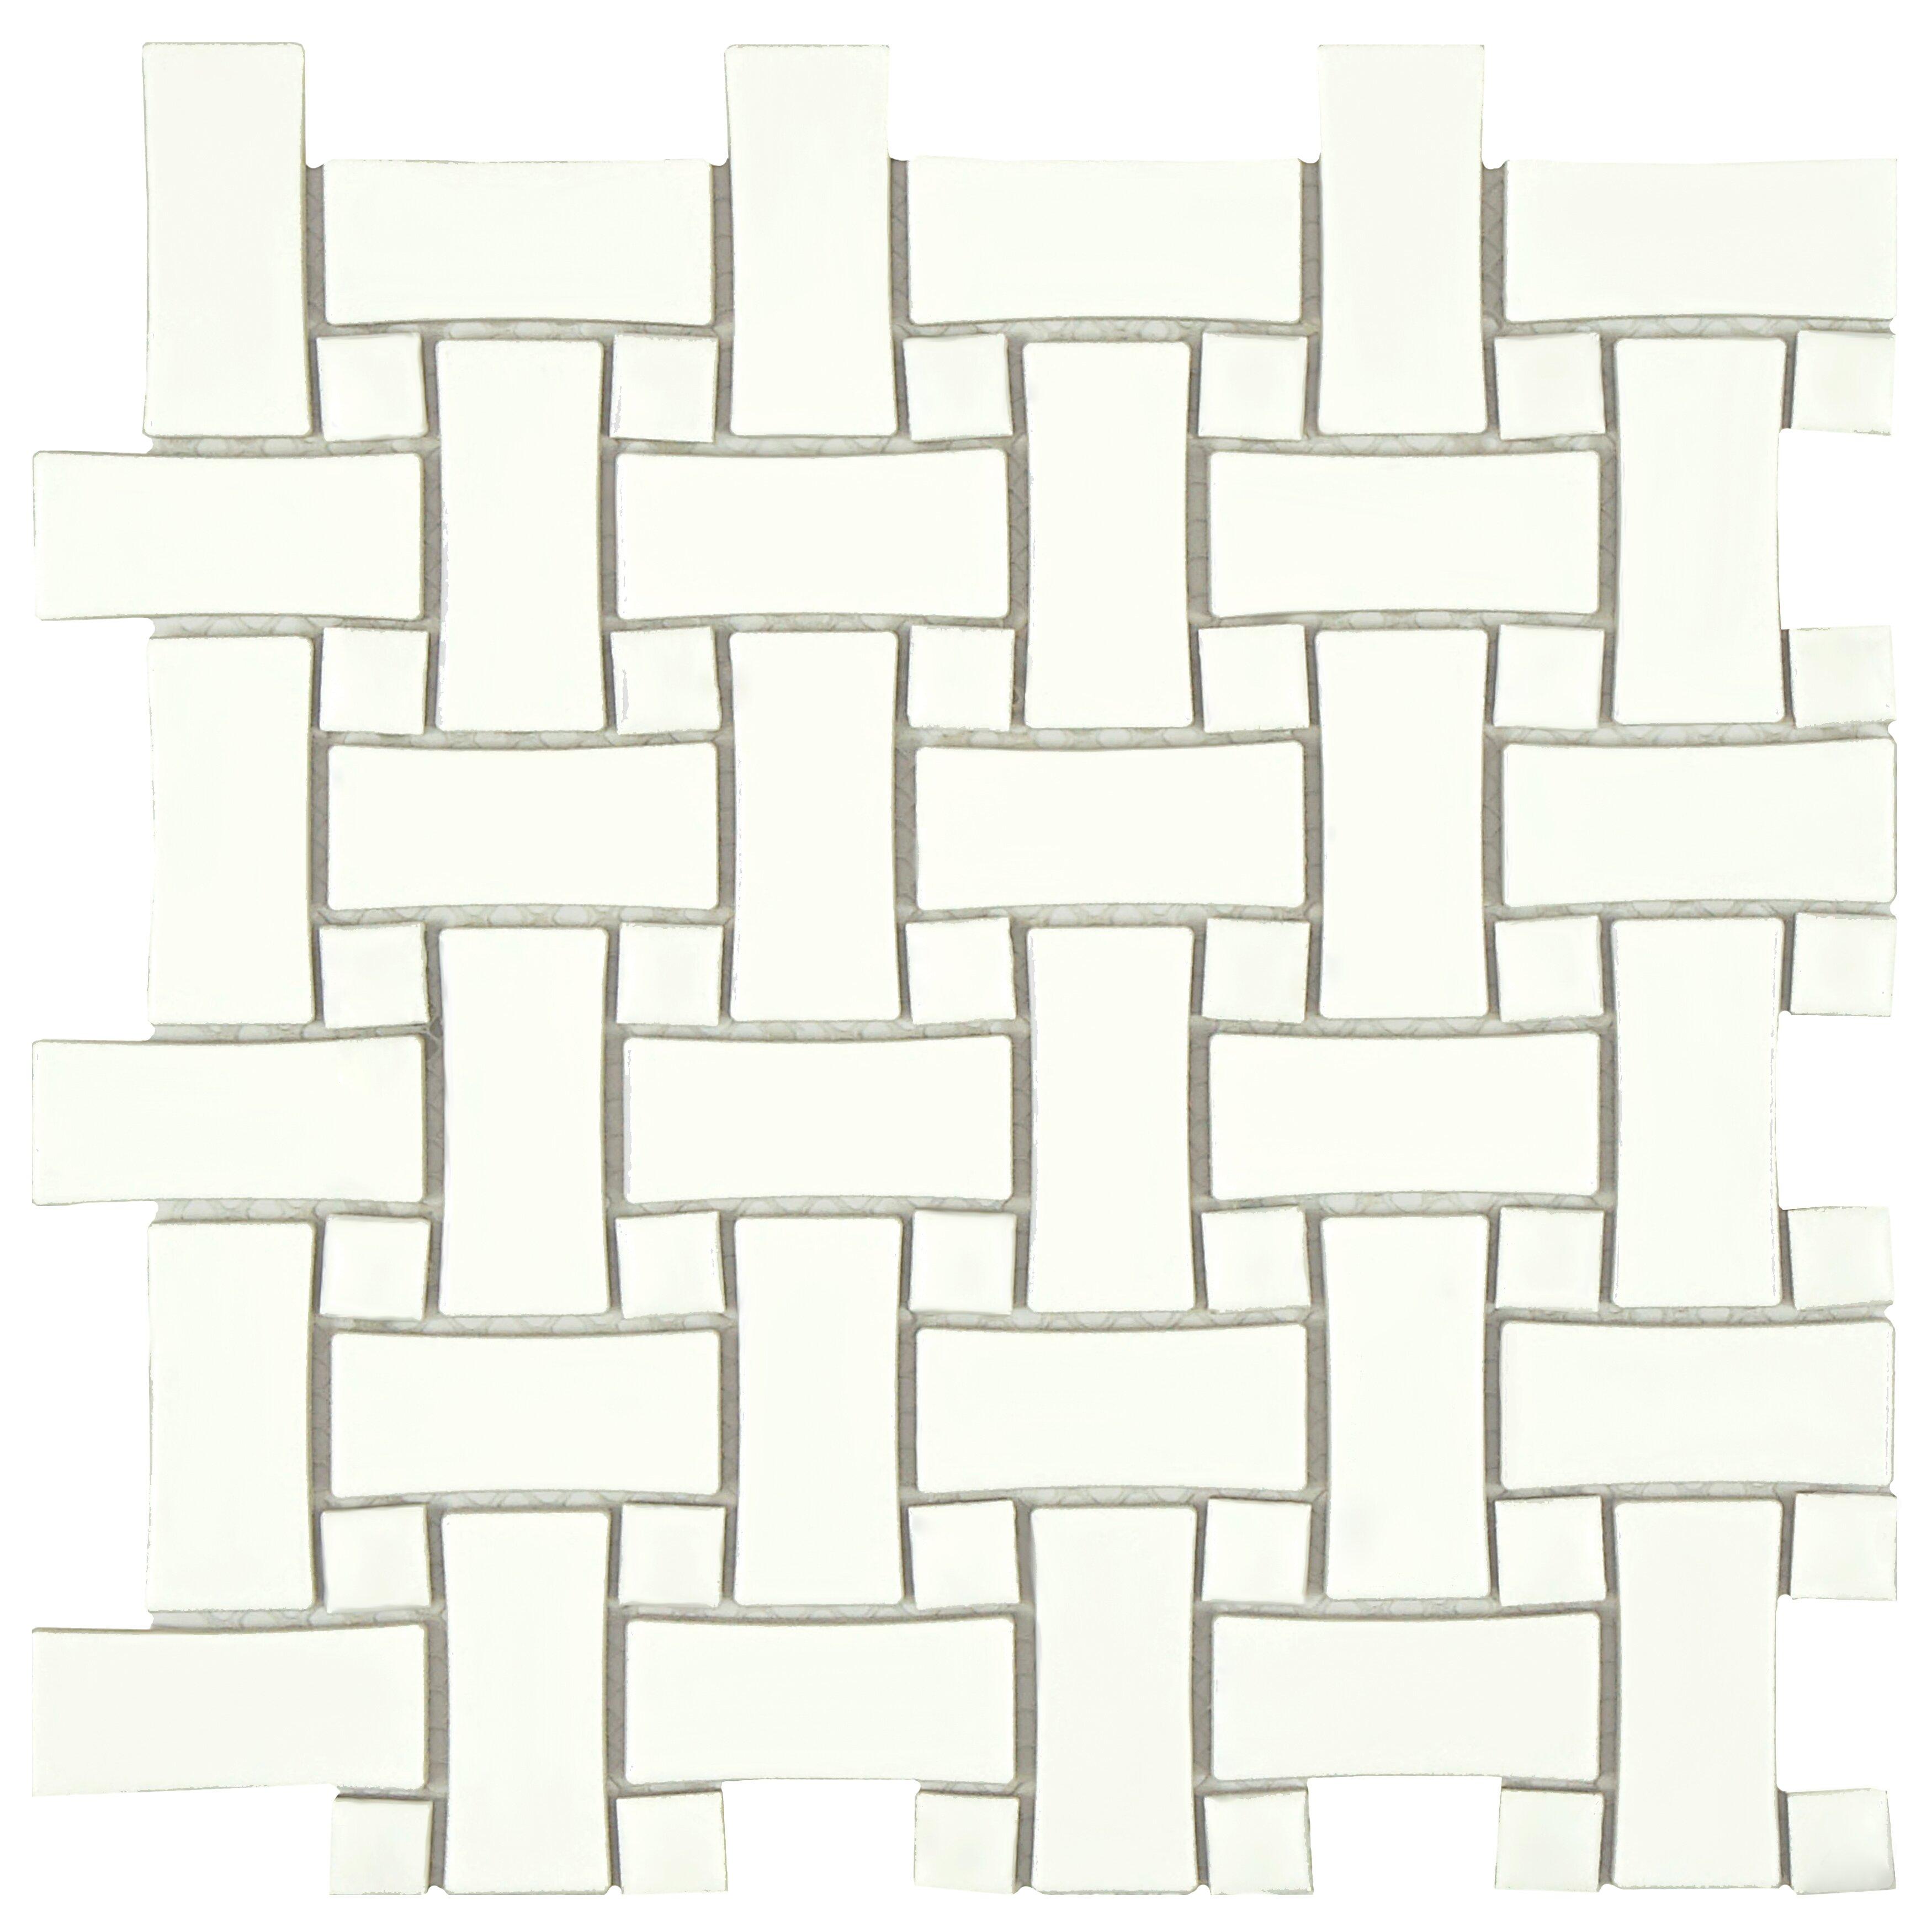 Elitetile Retro Basket Weave 10 5 X 10 5 Porcelain Mosaic Tile In White Reviews Wayfair